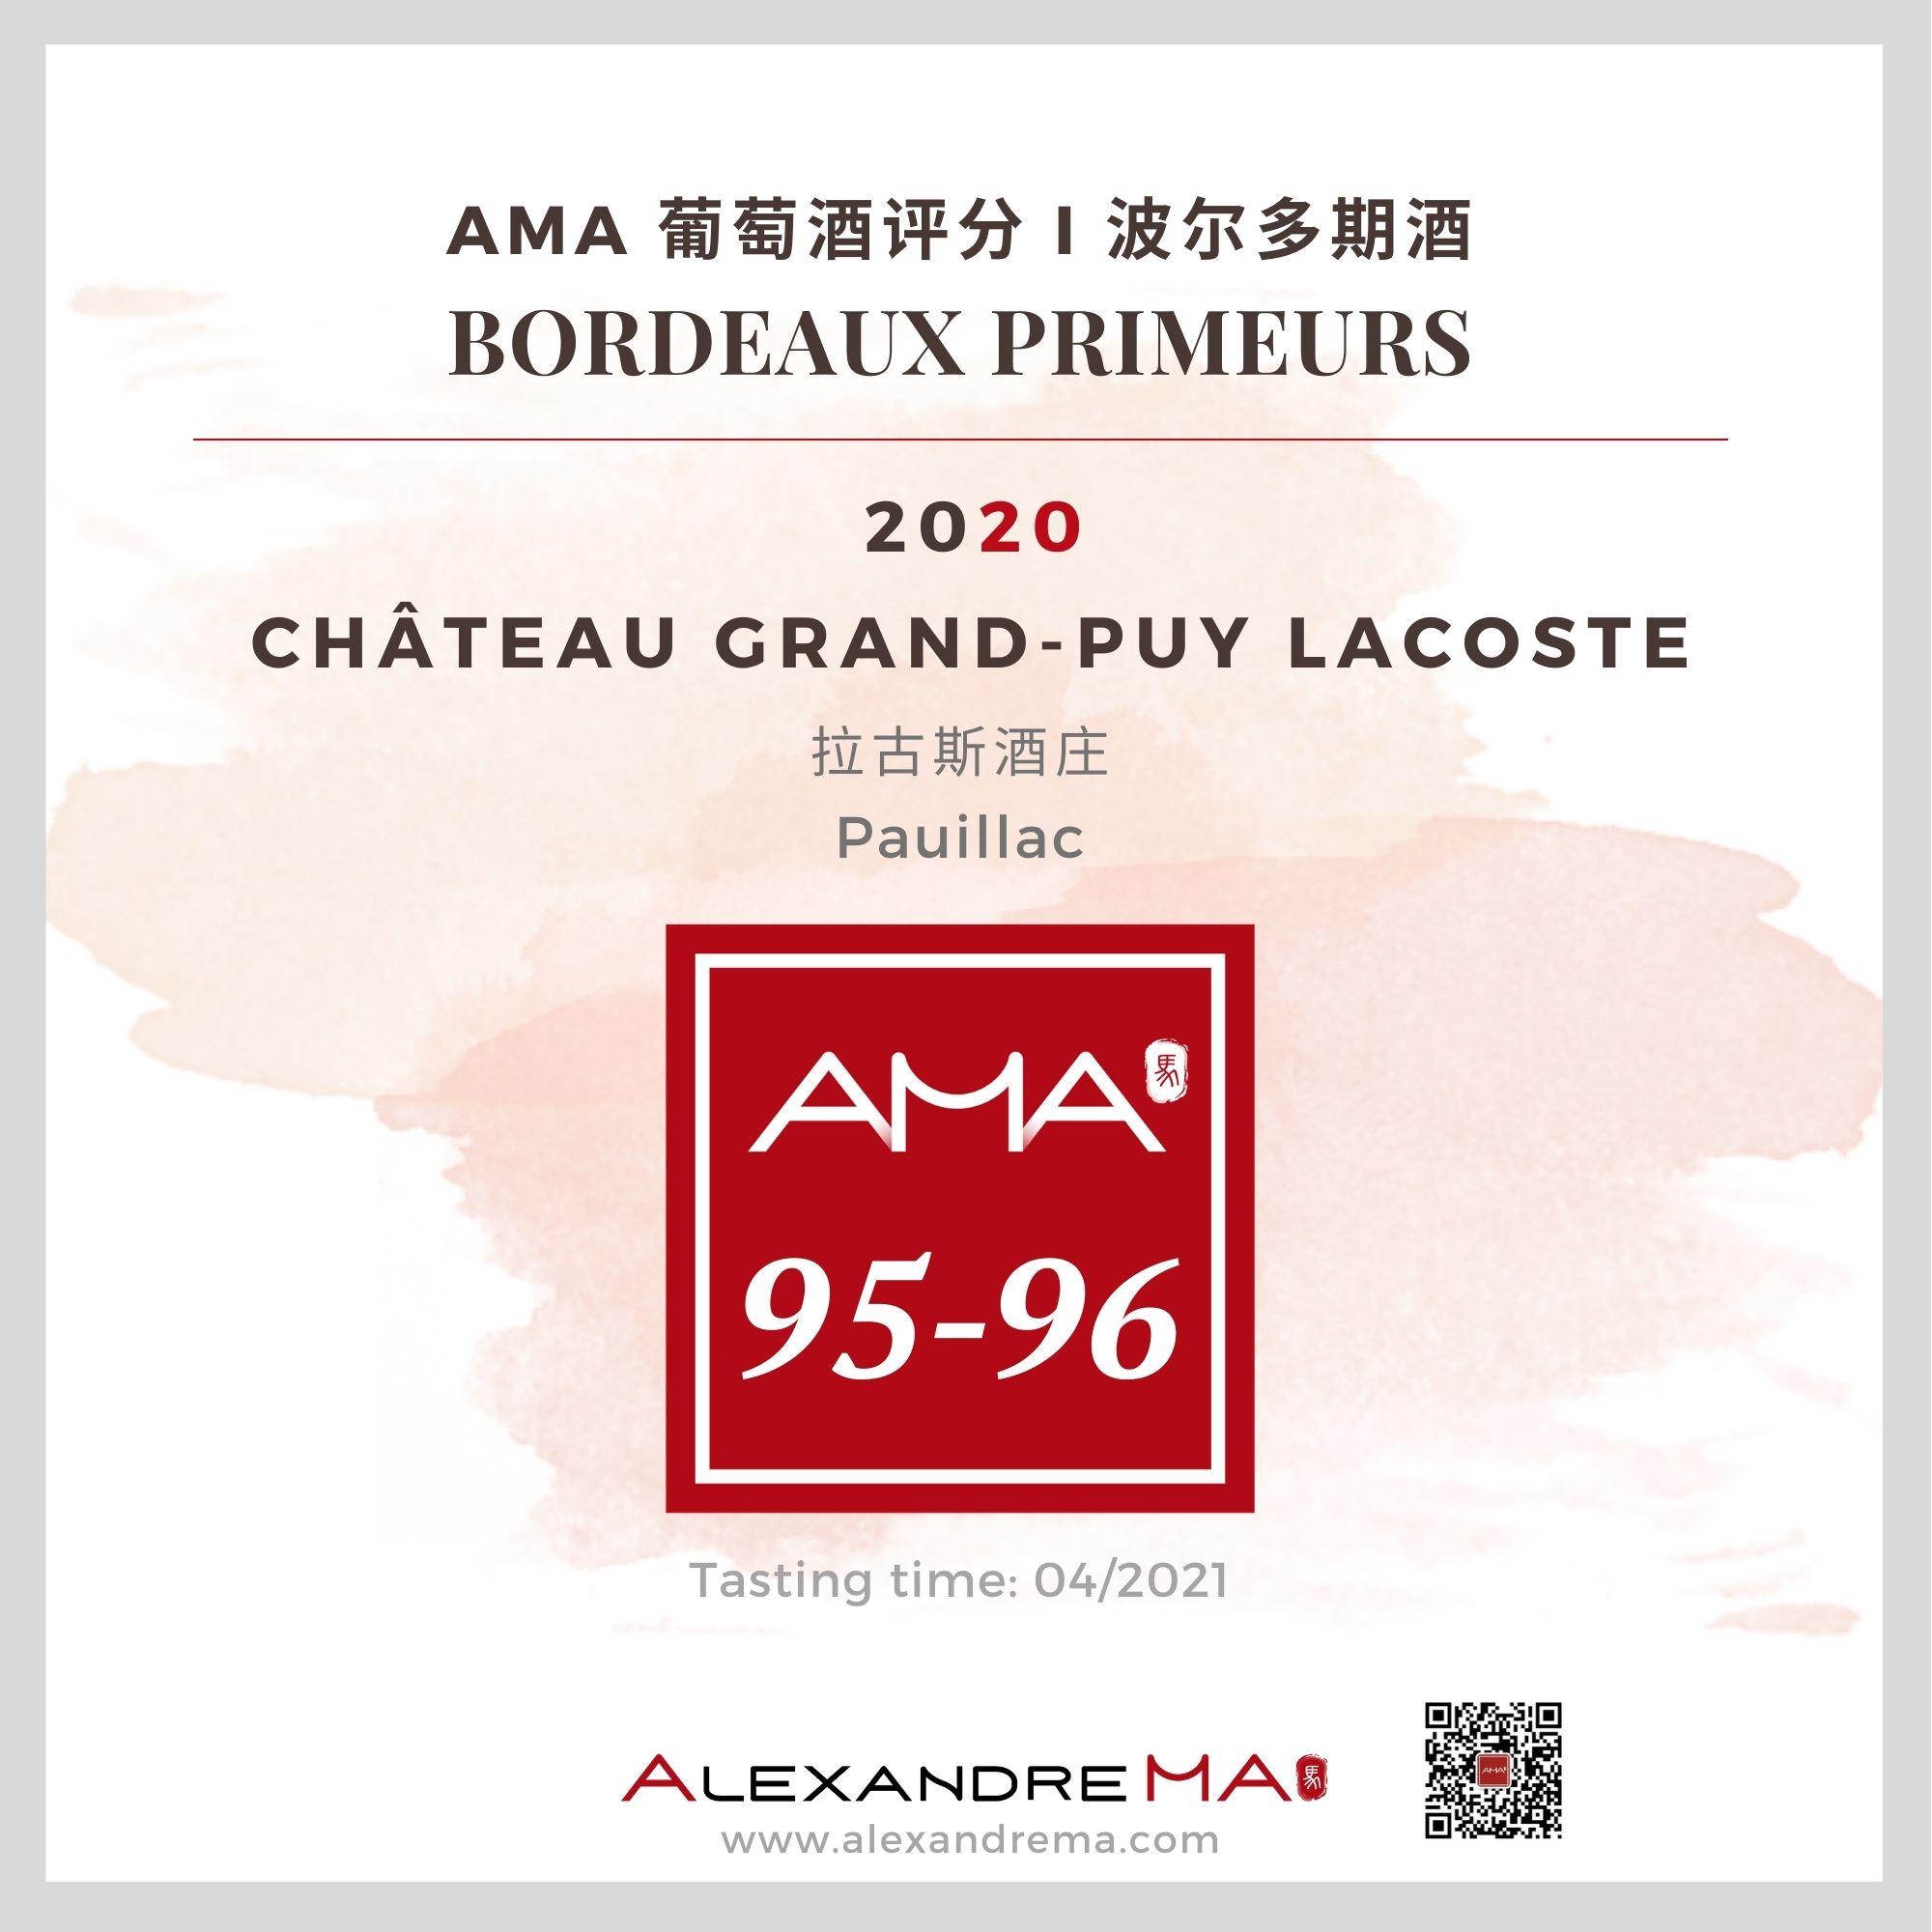 Château Grand-Puy Lacoste 2020 - Alexandre MA